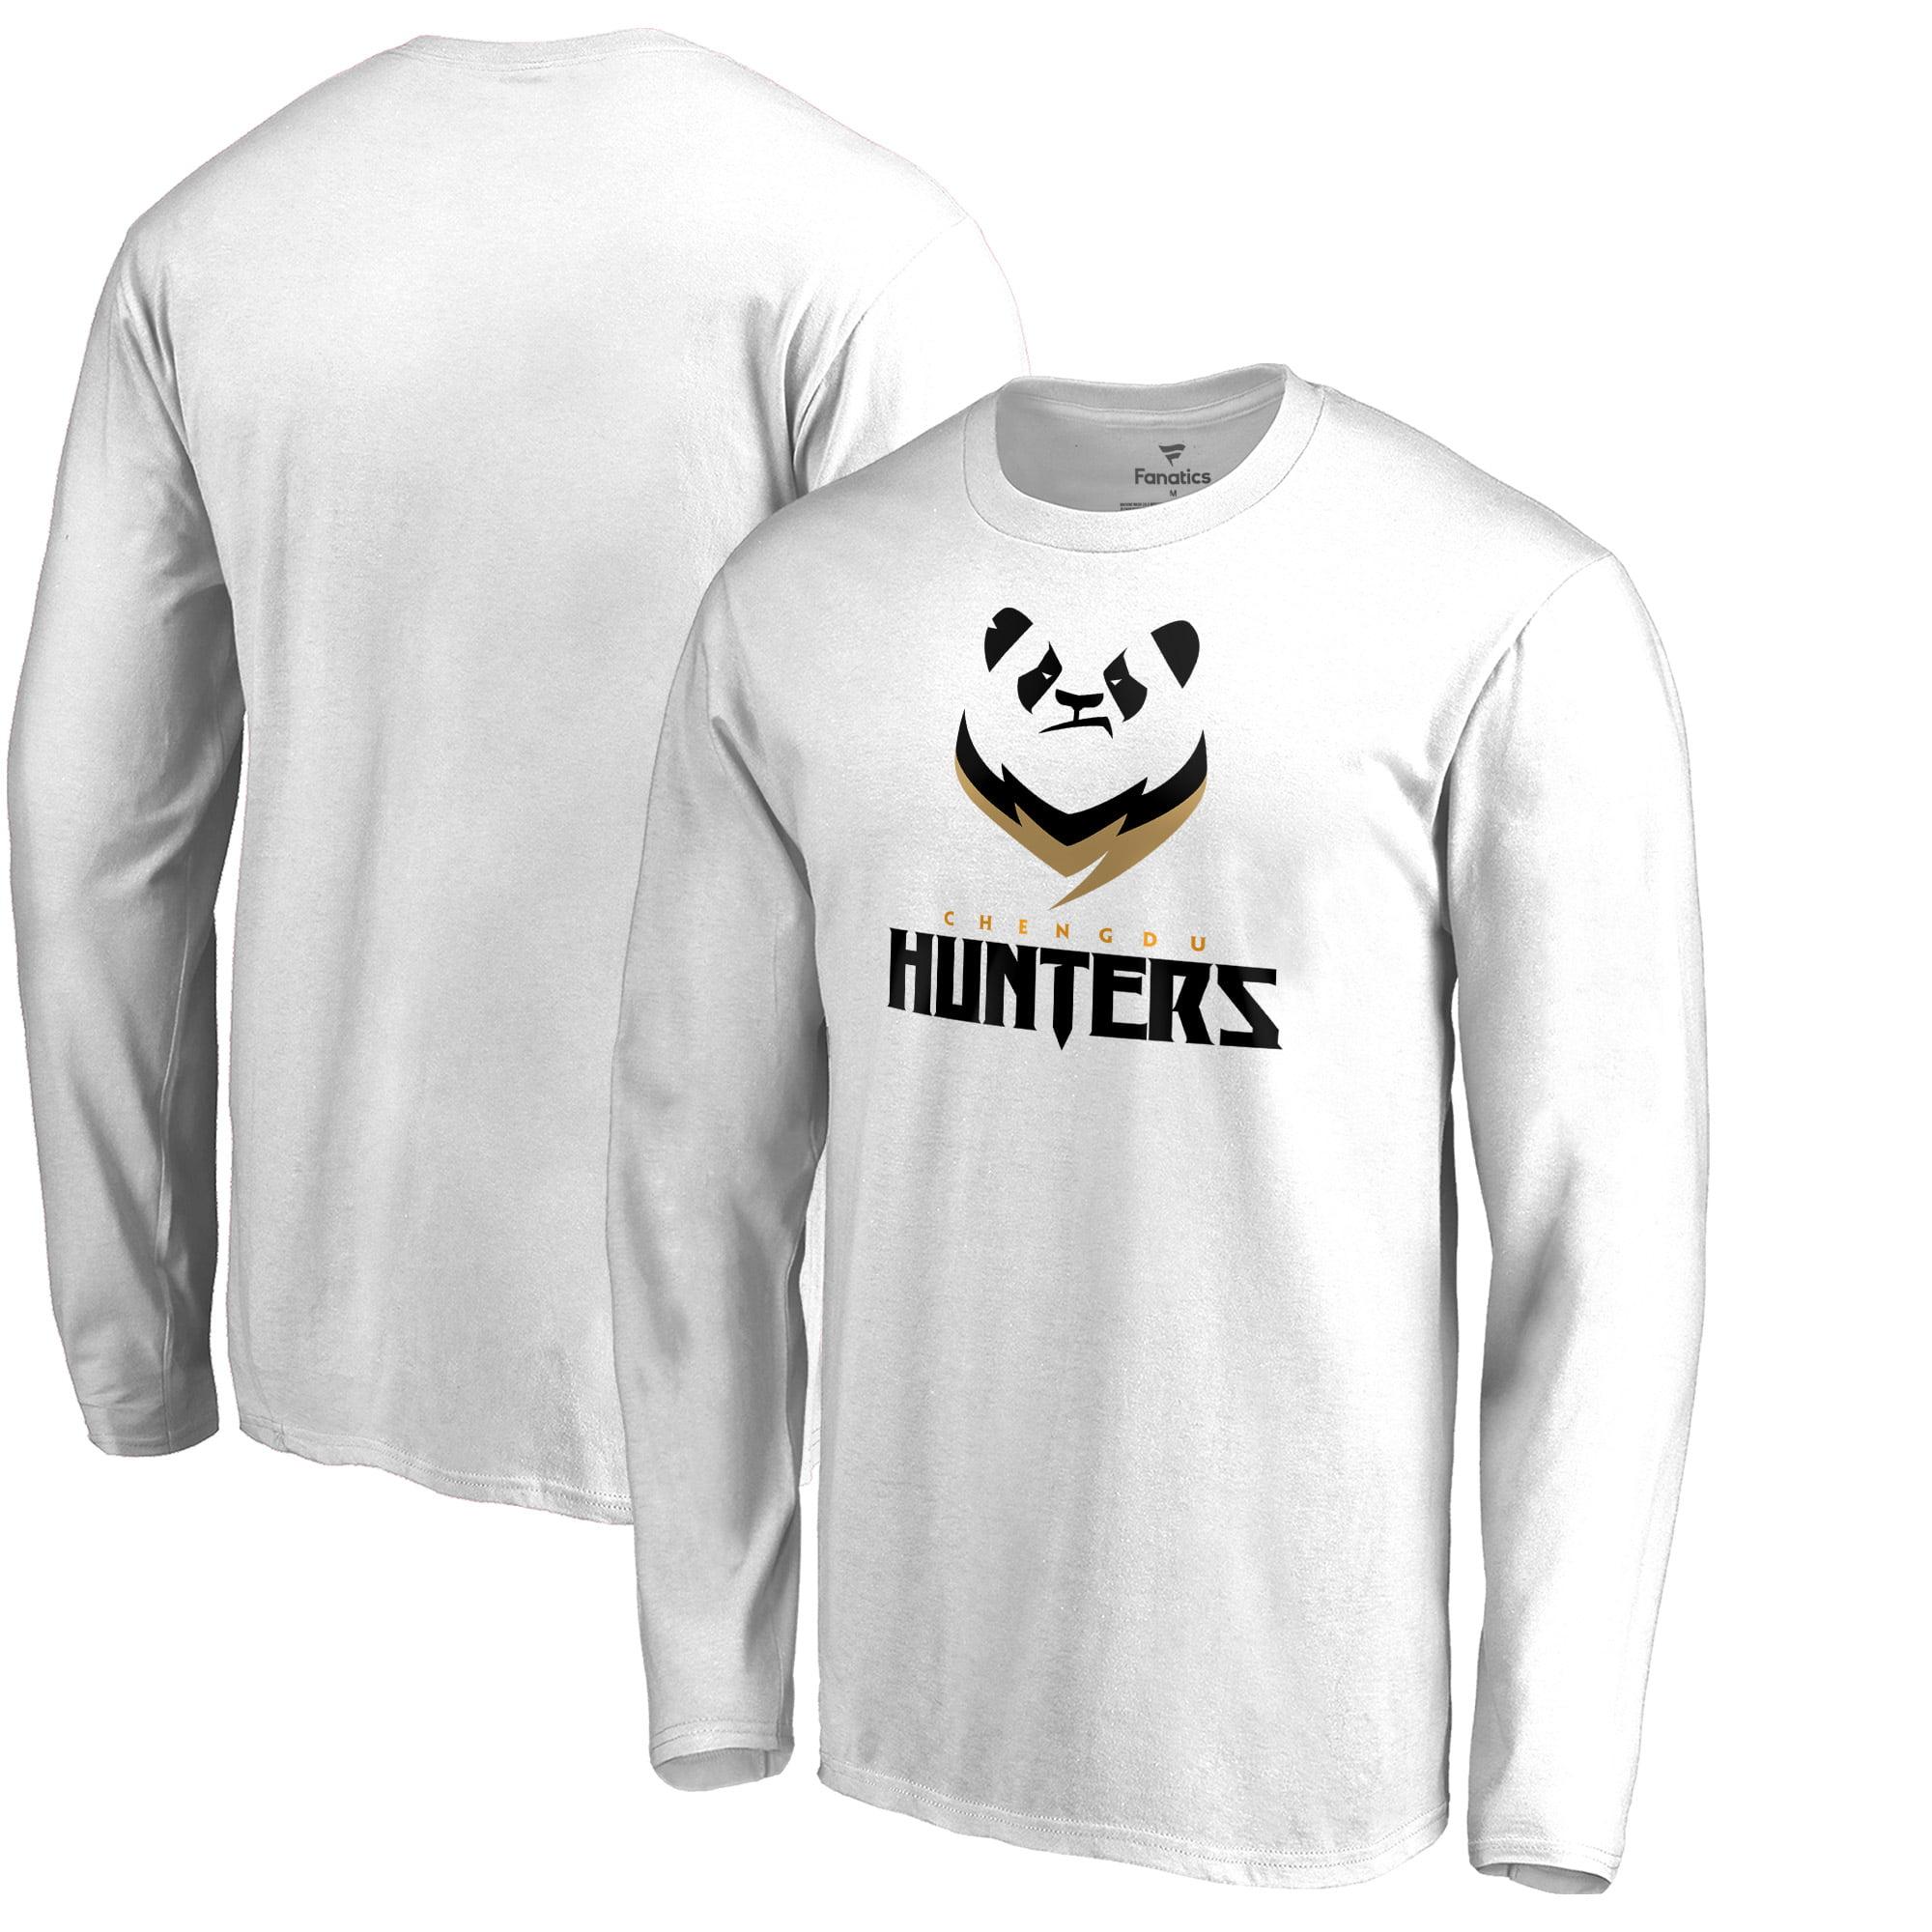 Chengdu Hunters Fanatics Branded Team Identity Long Sleeve T-Shirt - White